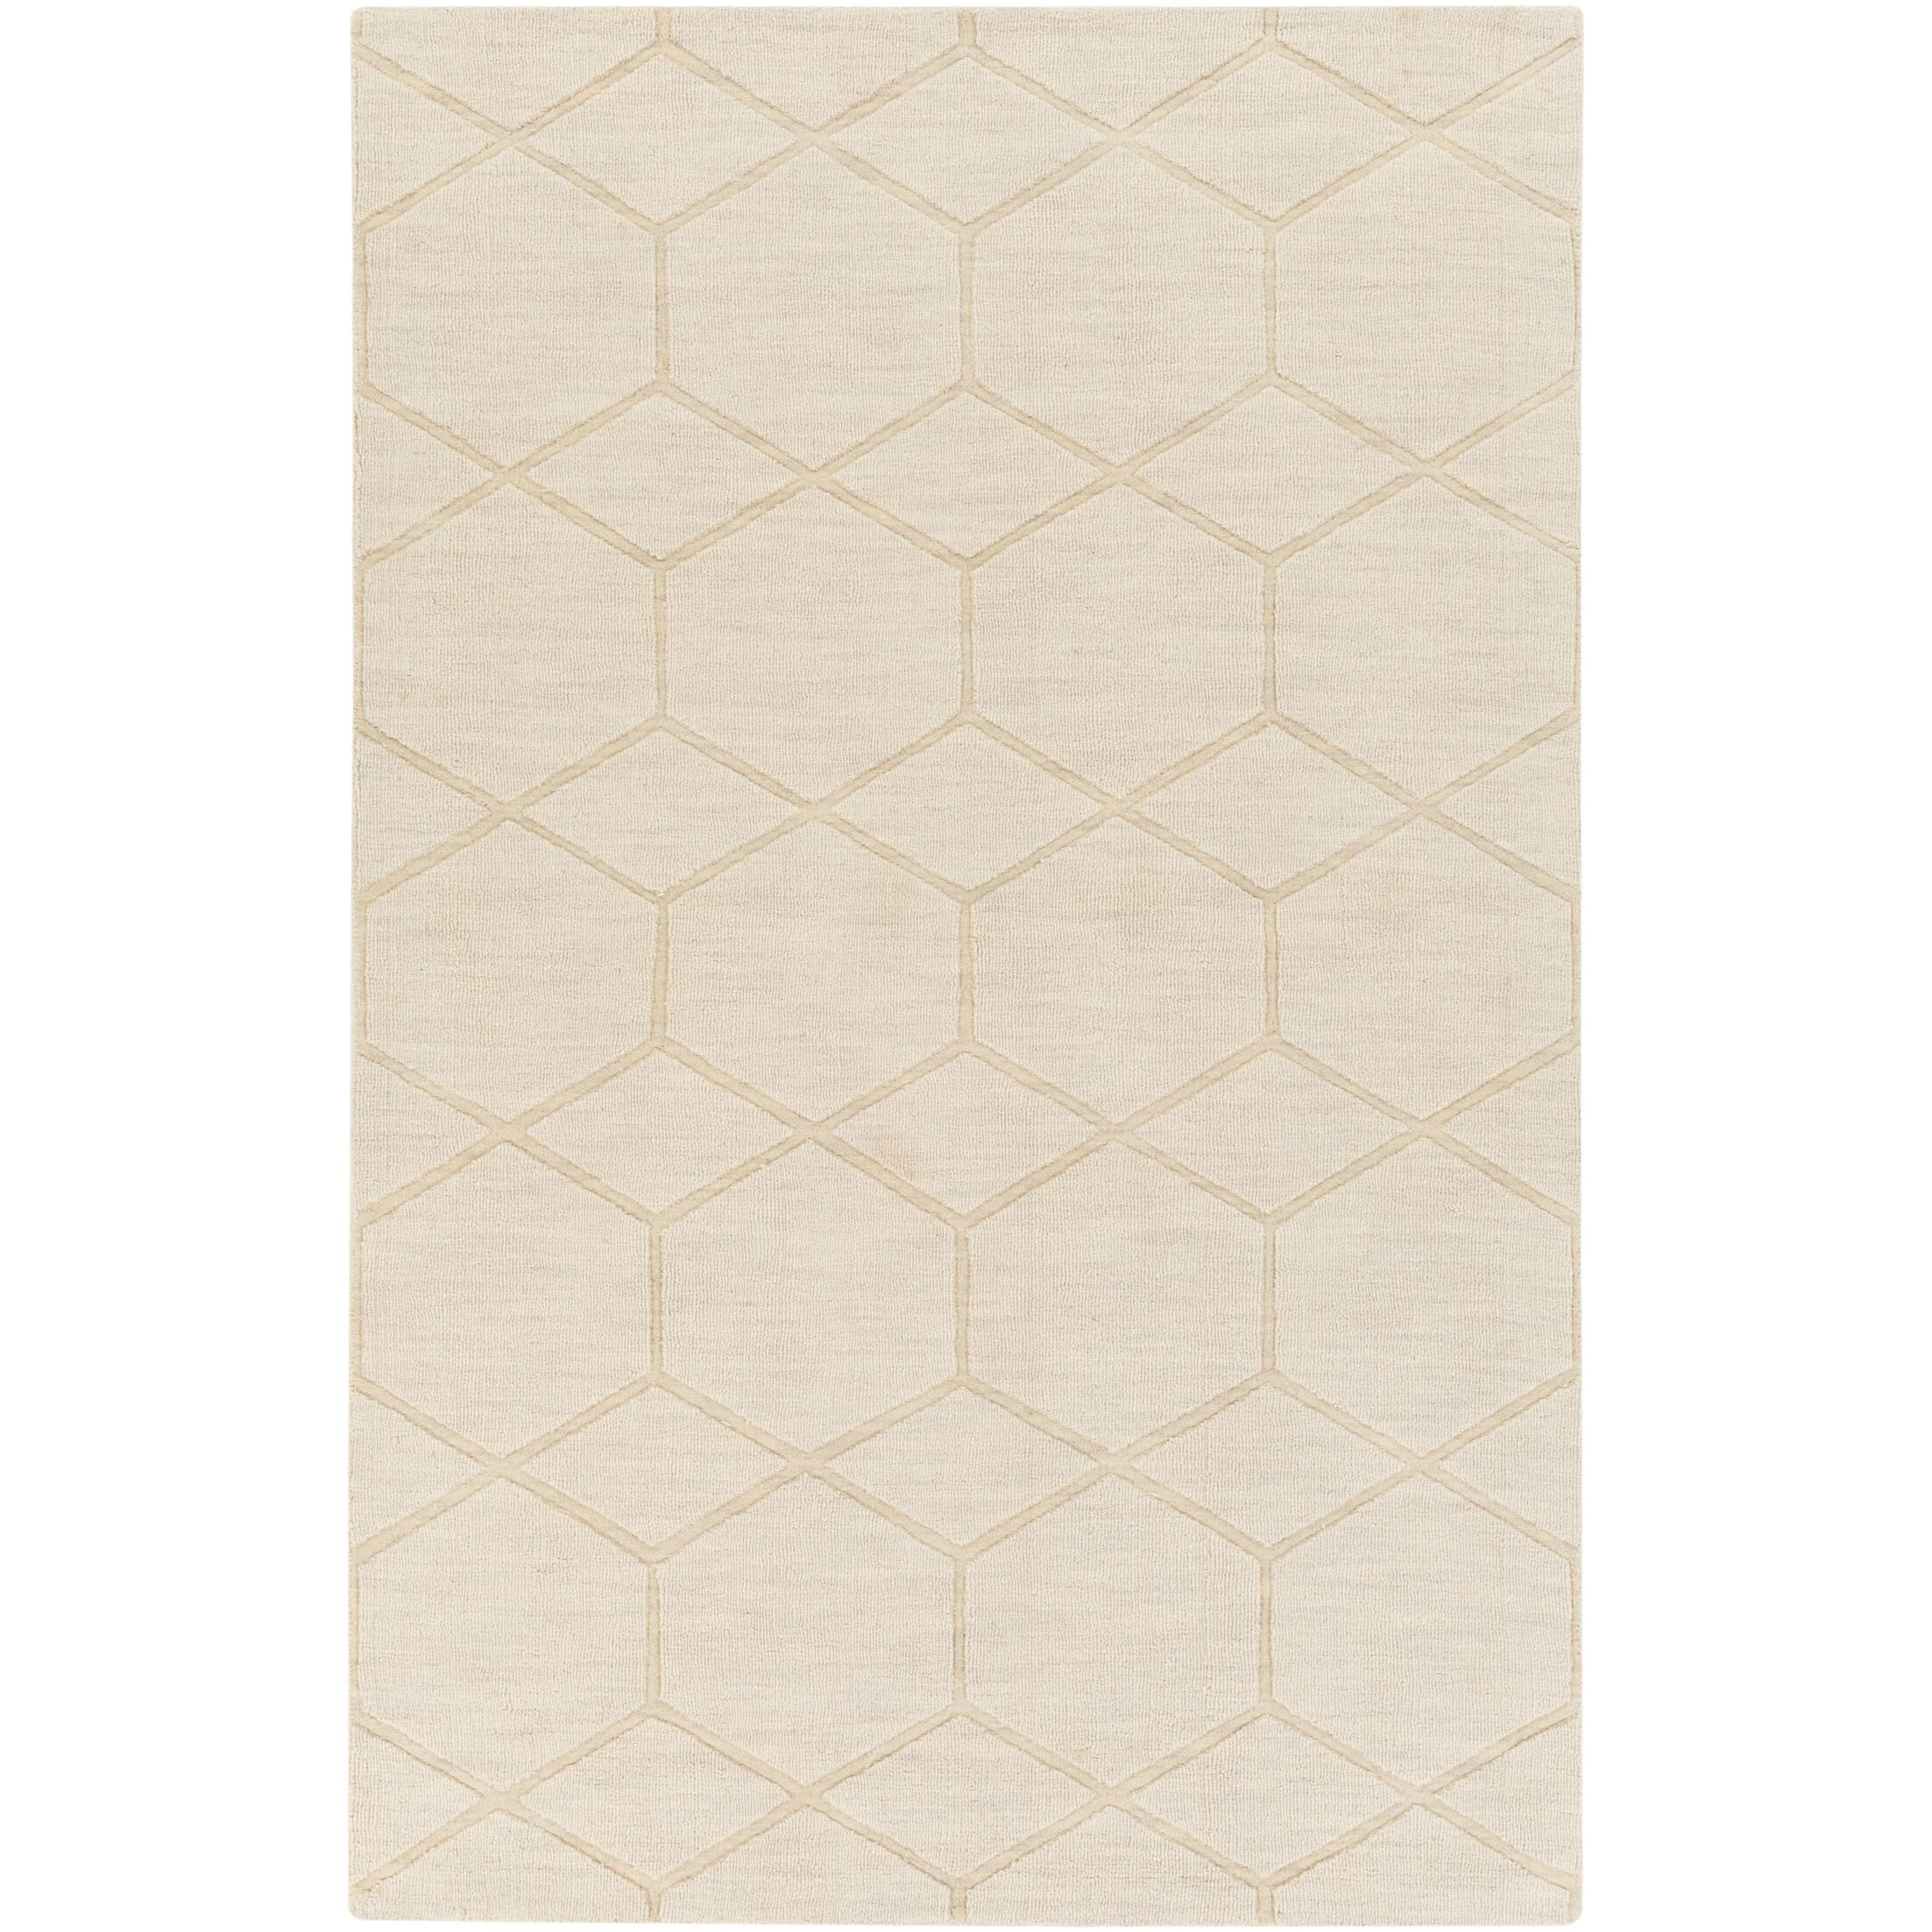 Peever Hand-Loomed Khaki Area Rug Rug Size: Rectangle 8' x 11'